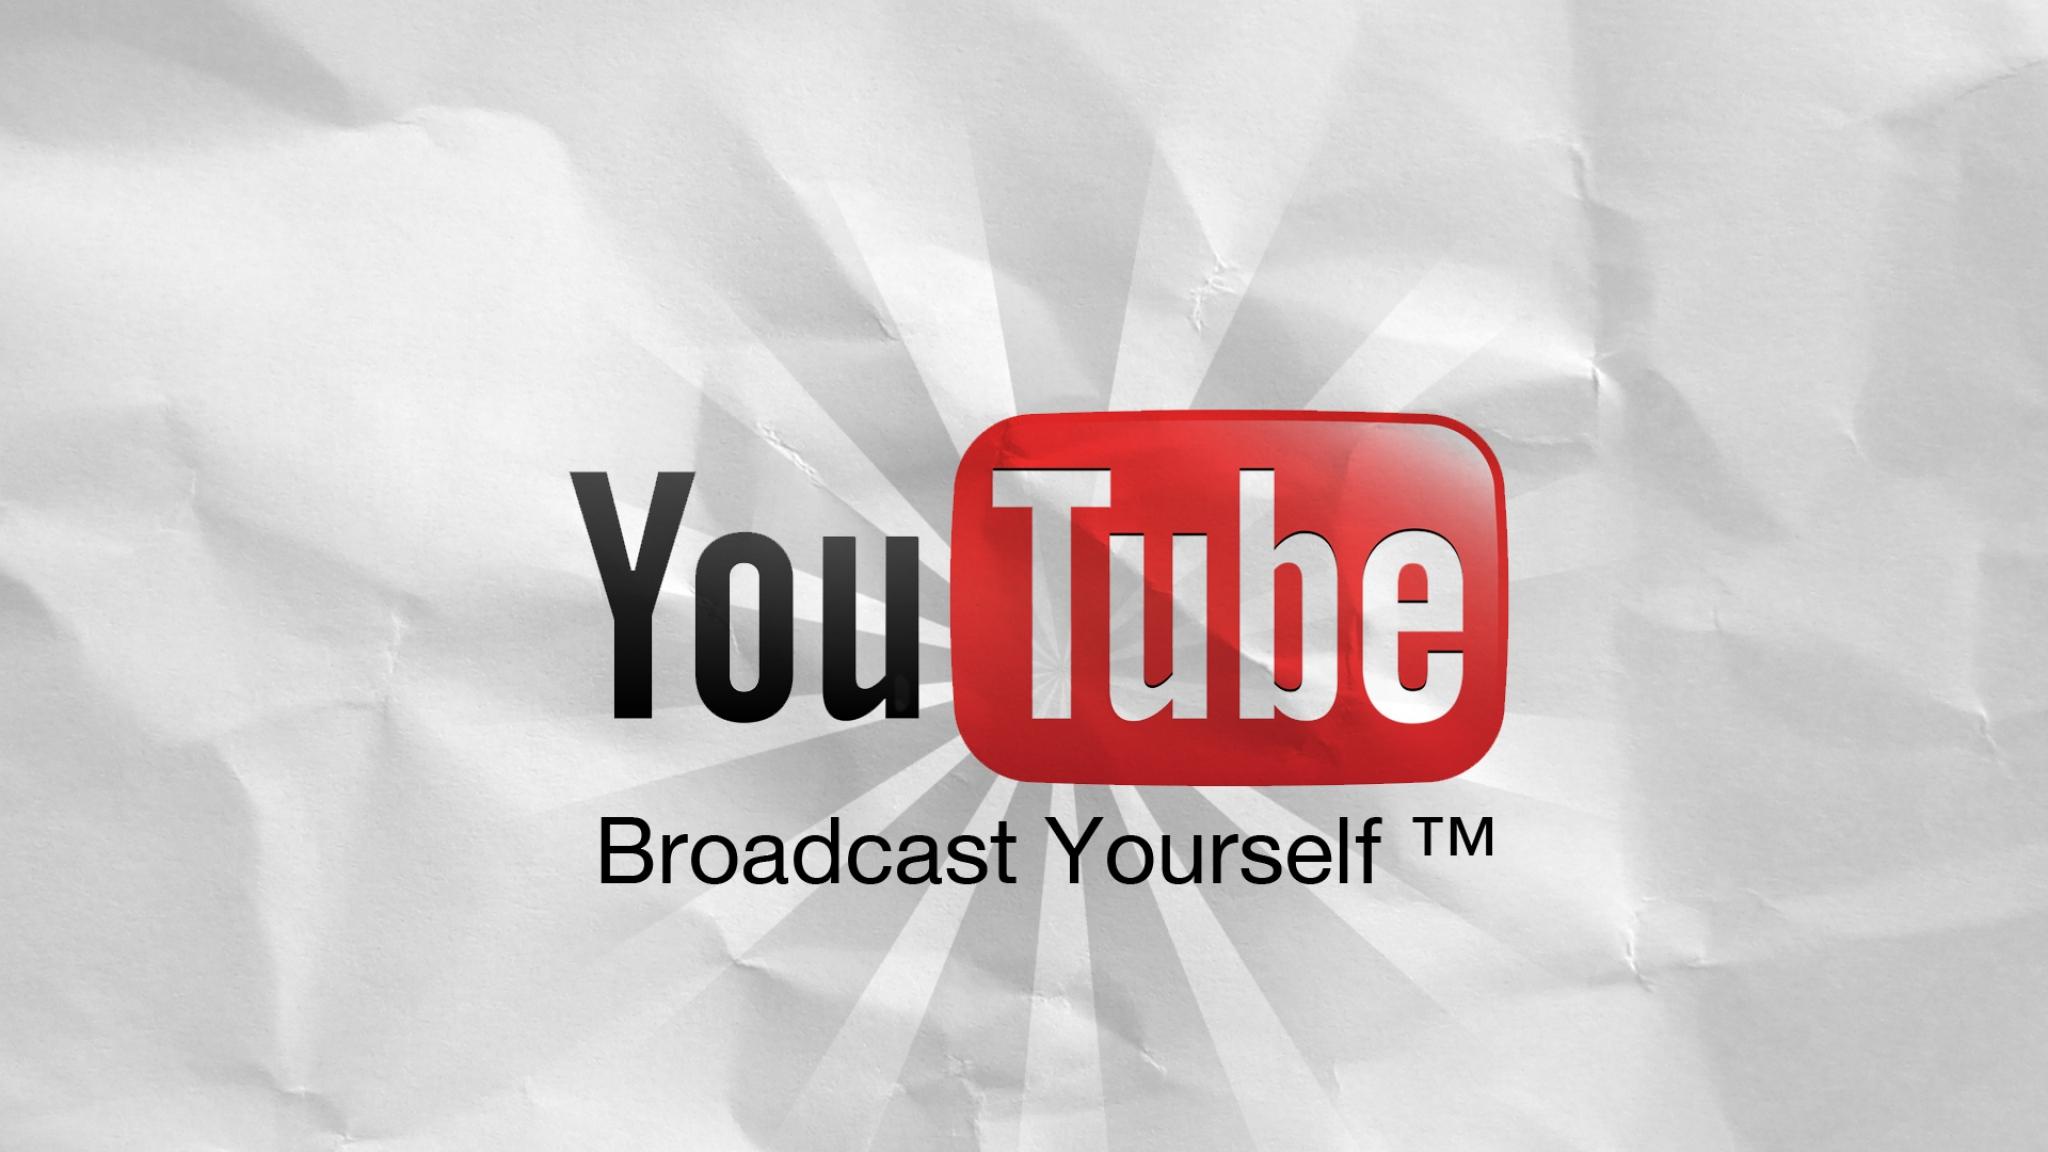 49 2048x1152 Youtube Wallpaper On Wallpapersafari